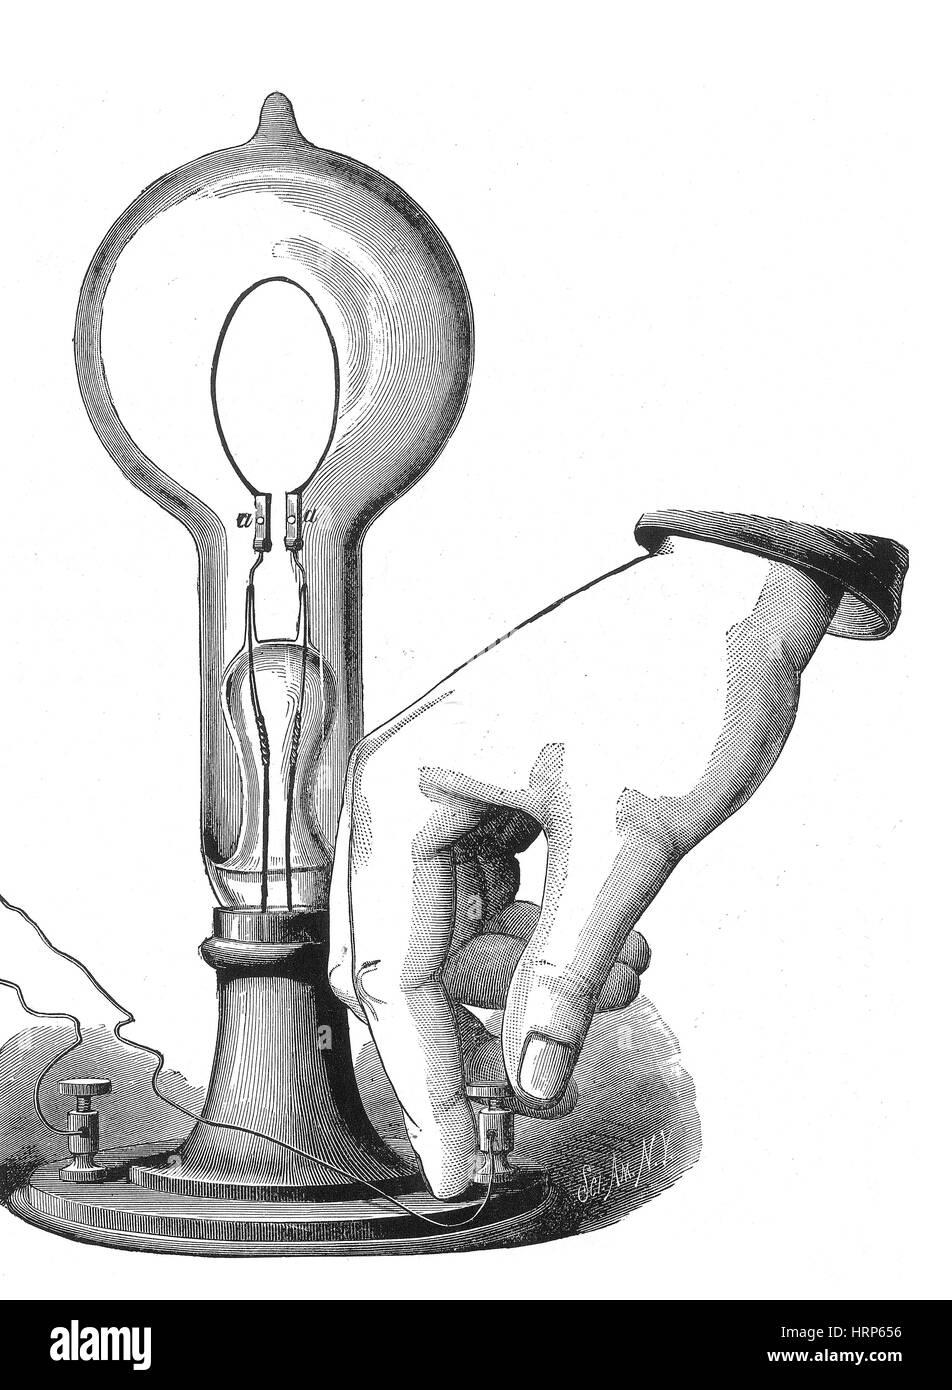 Thomas Edison Lampe A Incandescence 1880 Banque D Images Photo